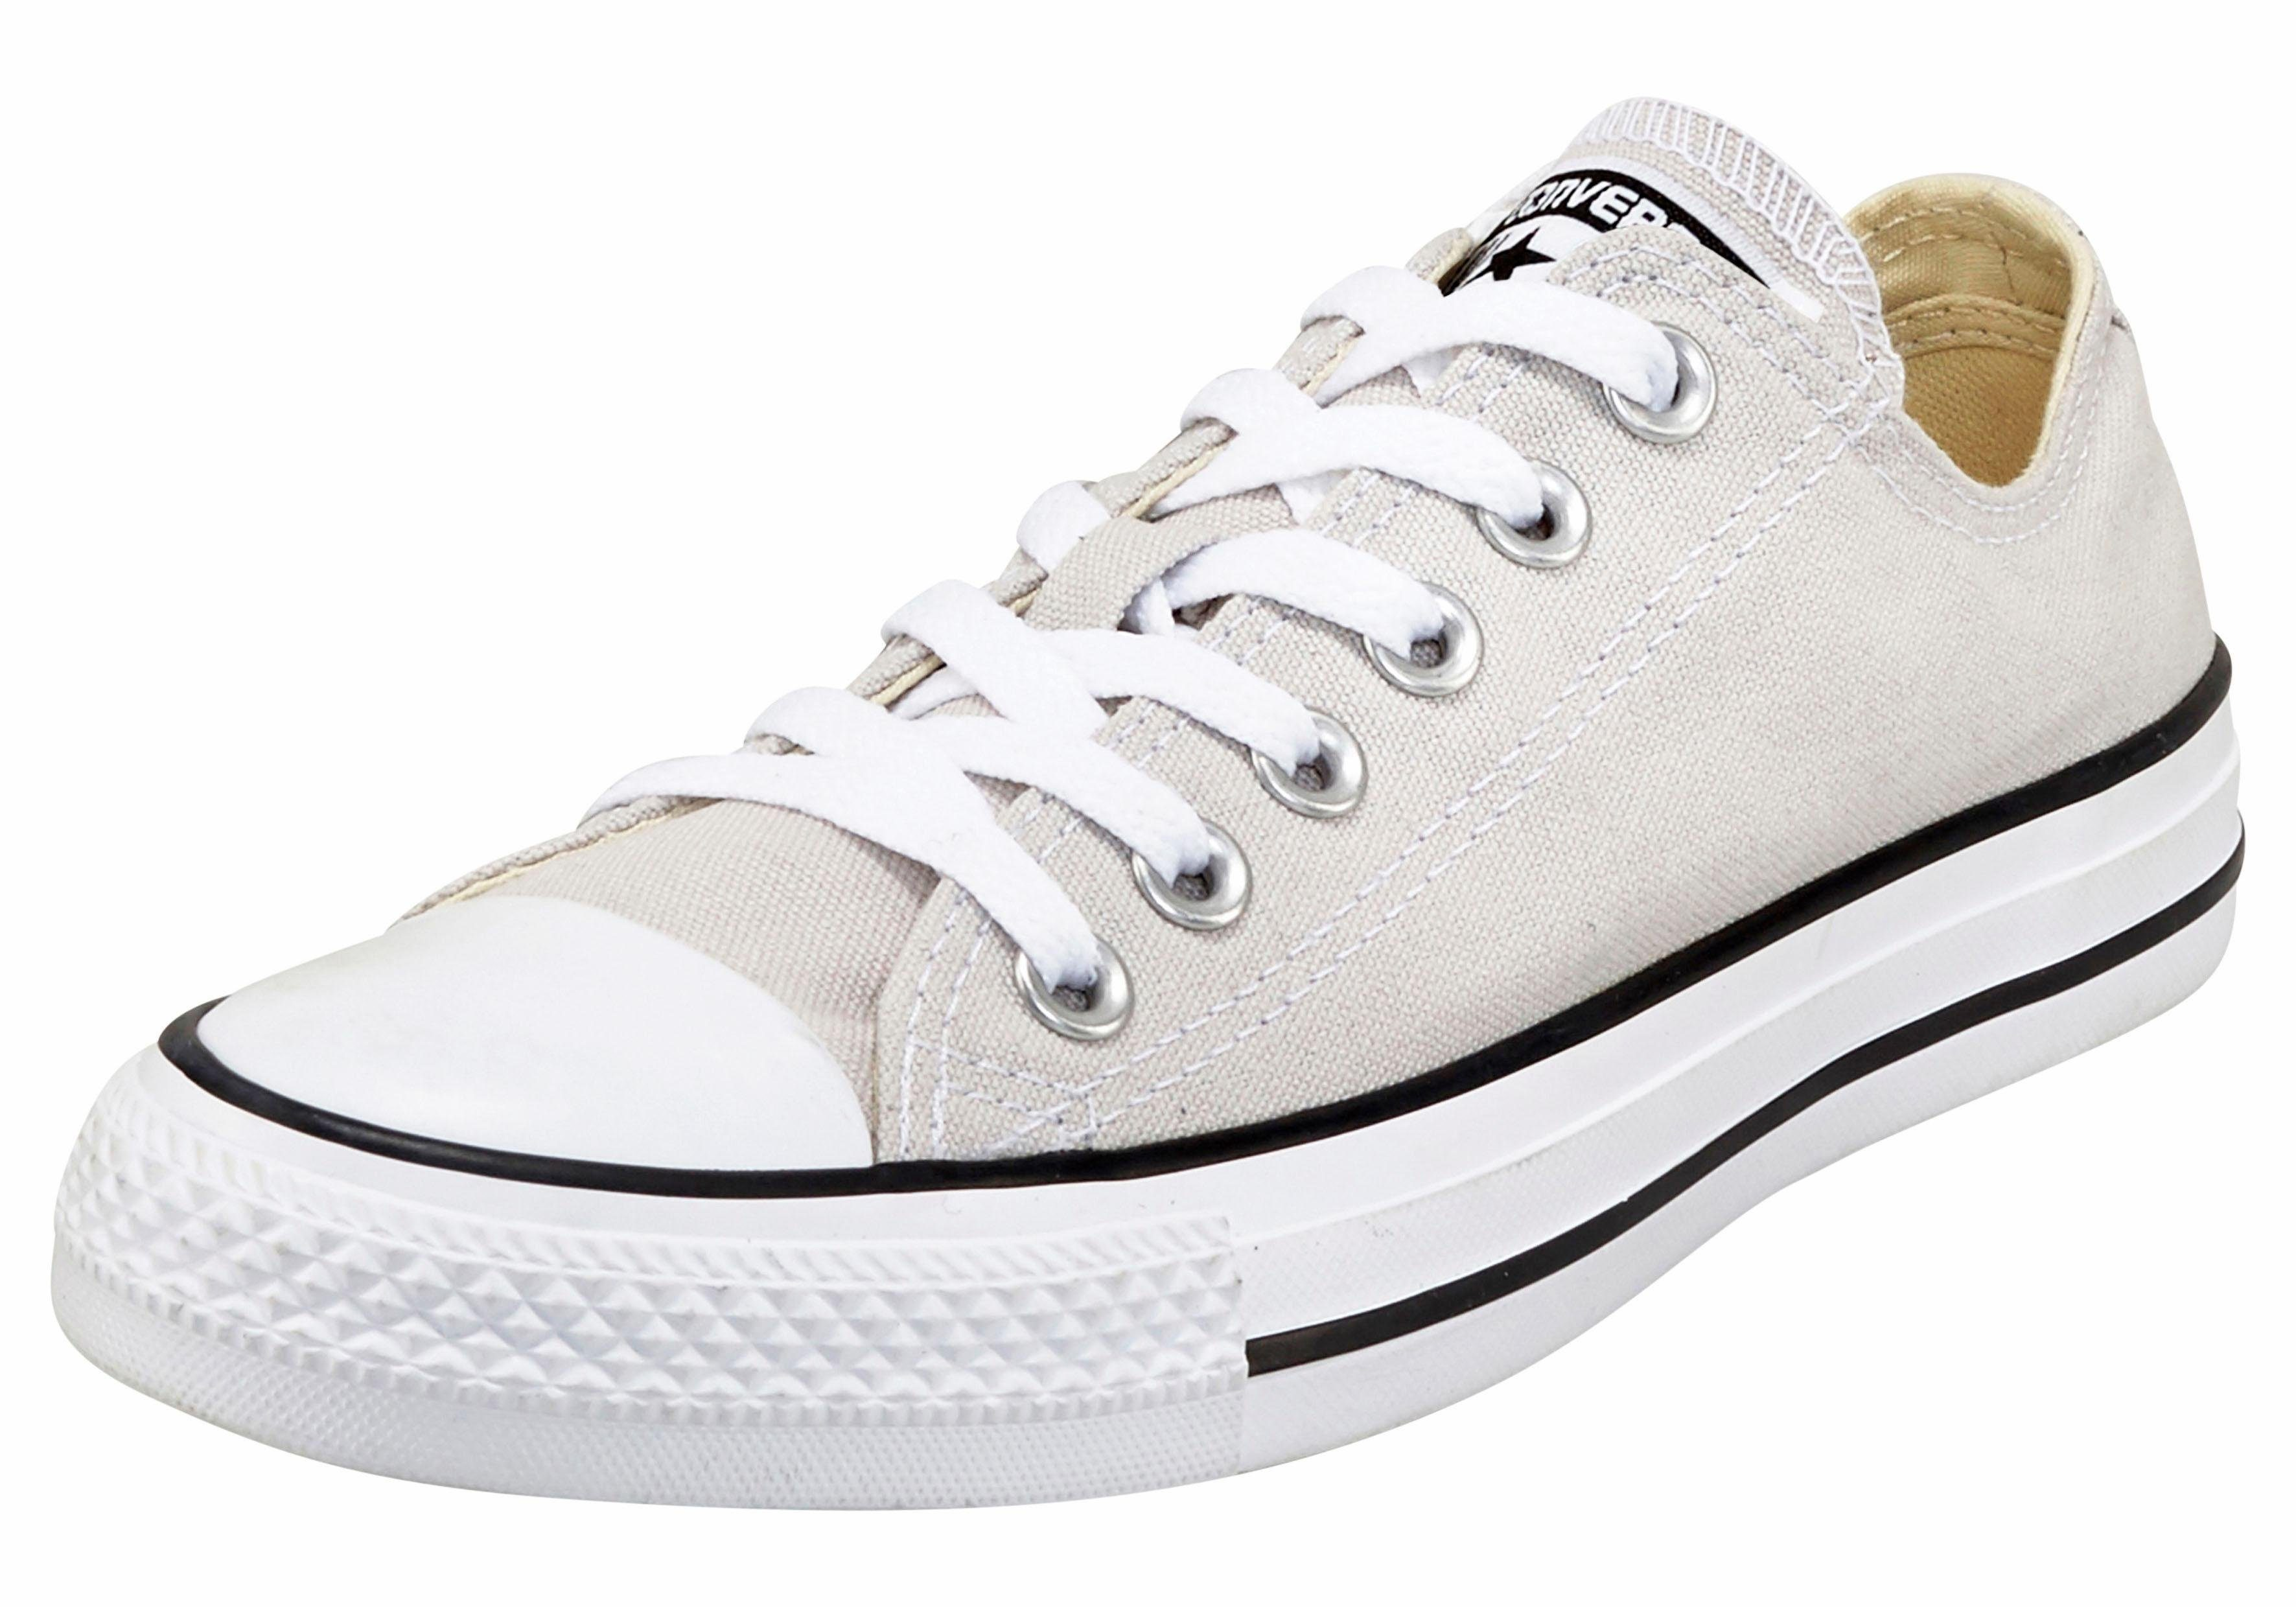 Converse Chuck Taylor All Star Ox Sneaker, Seasonal Unisex online kaufen  hellgrau